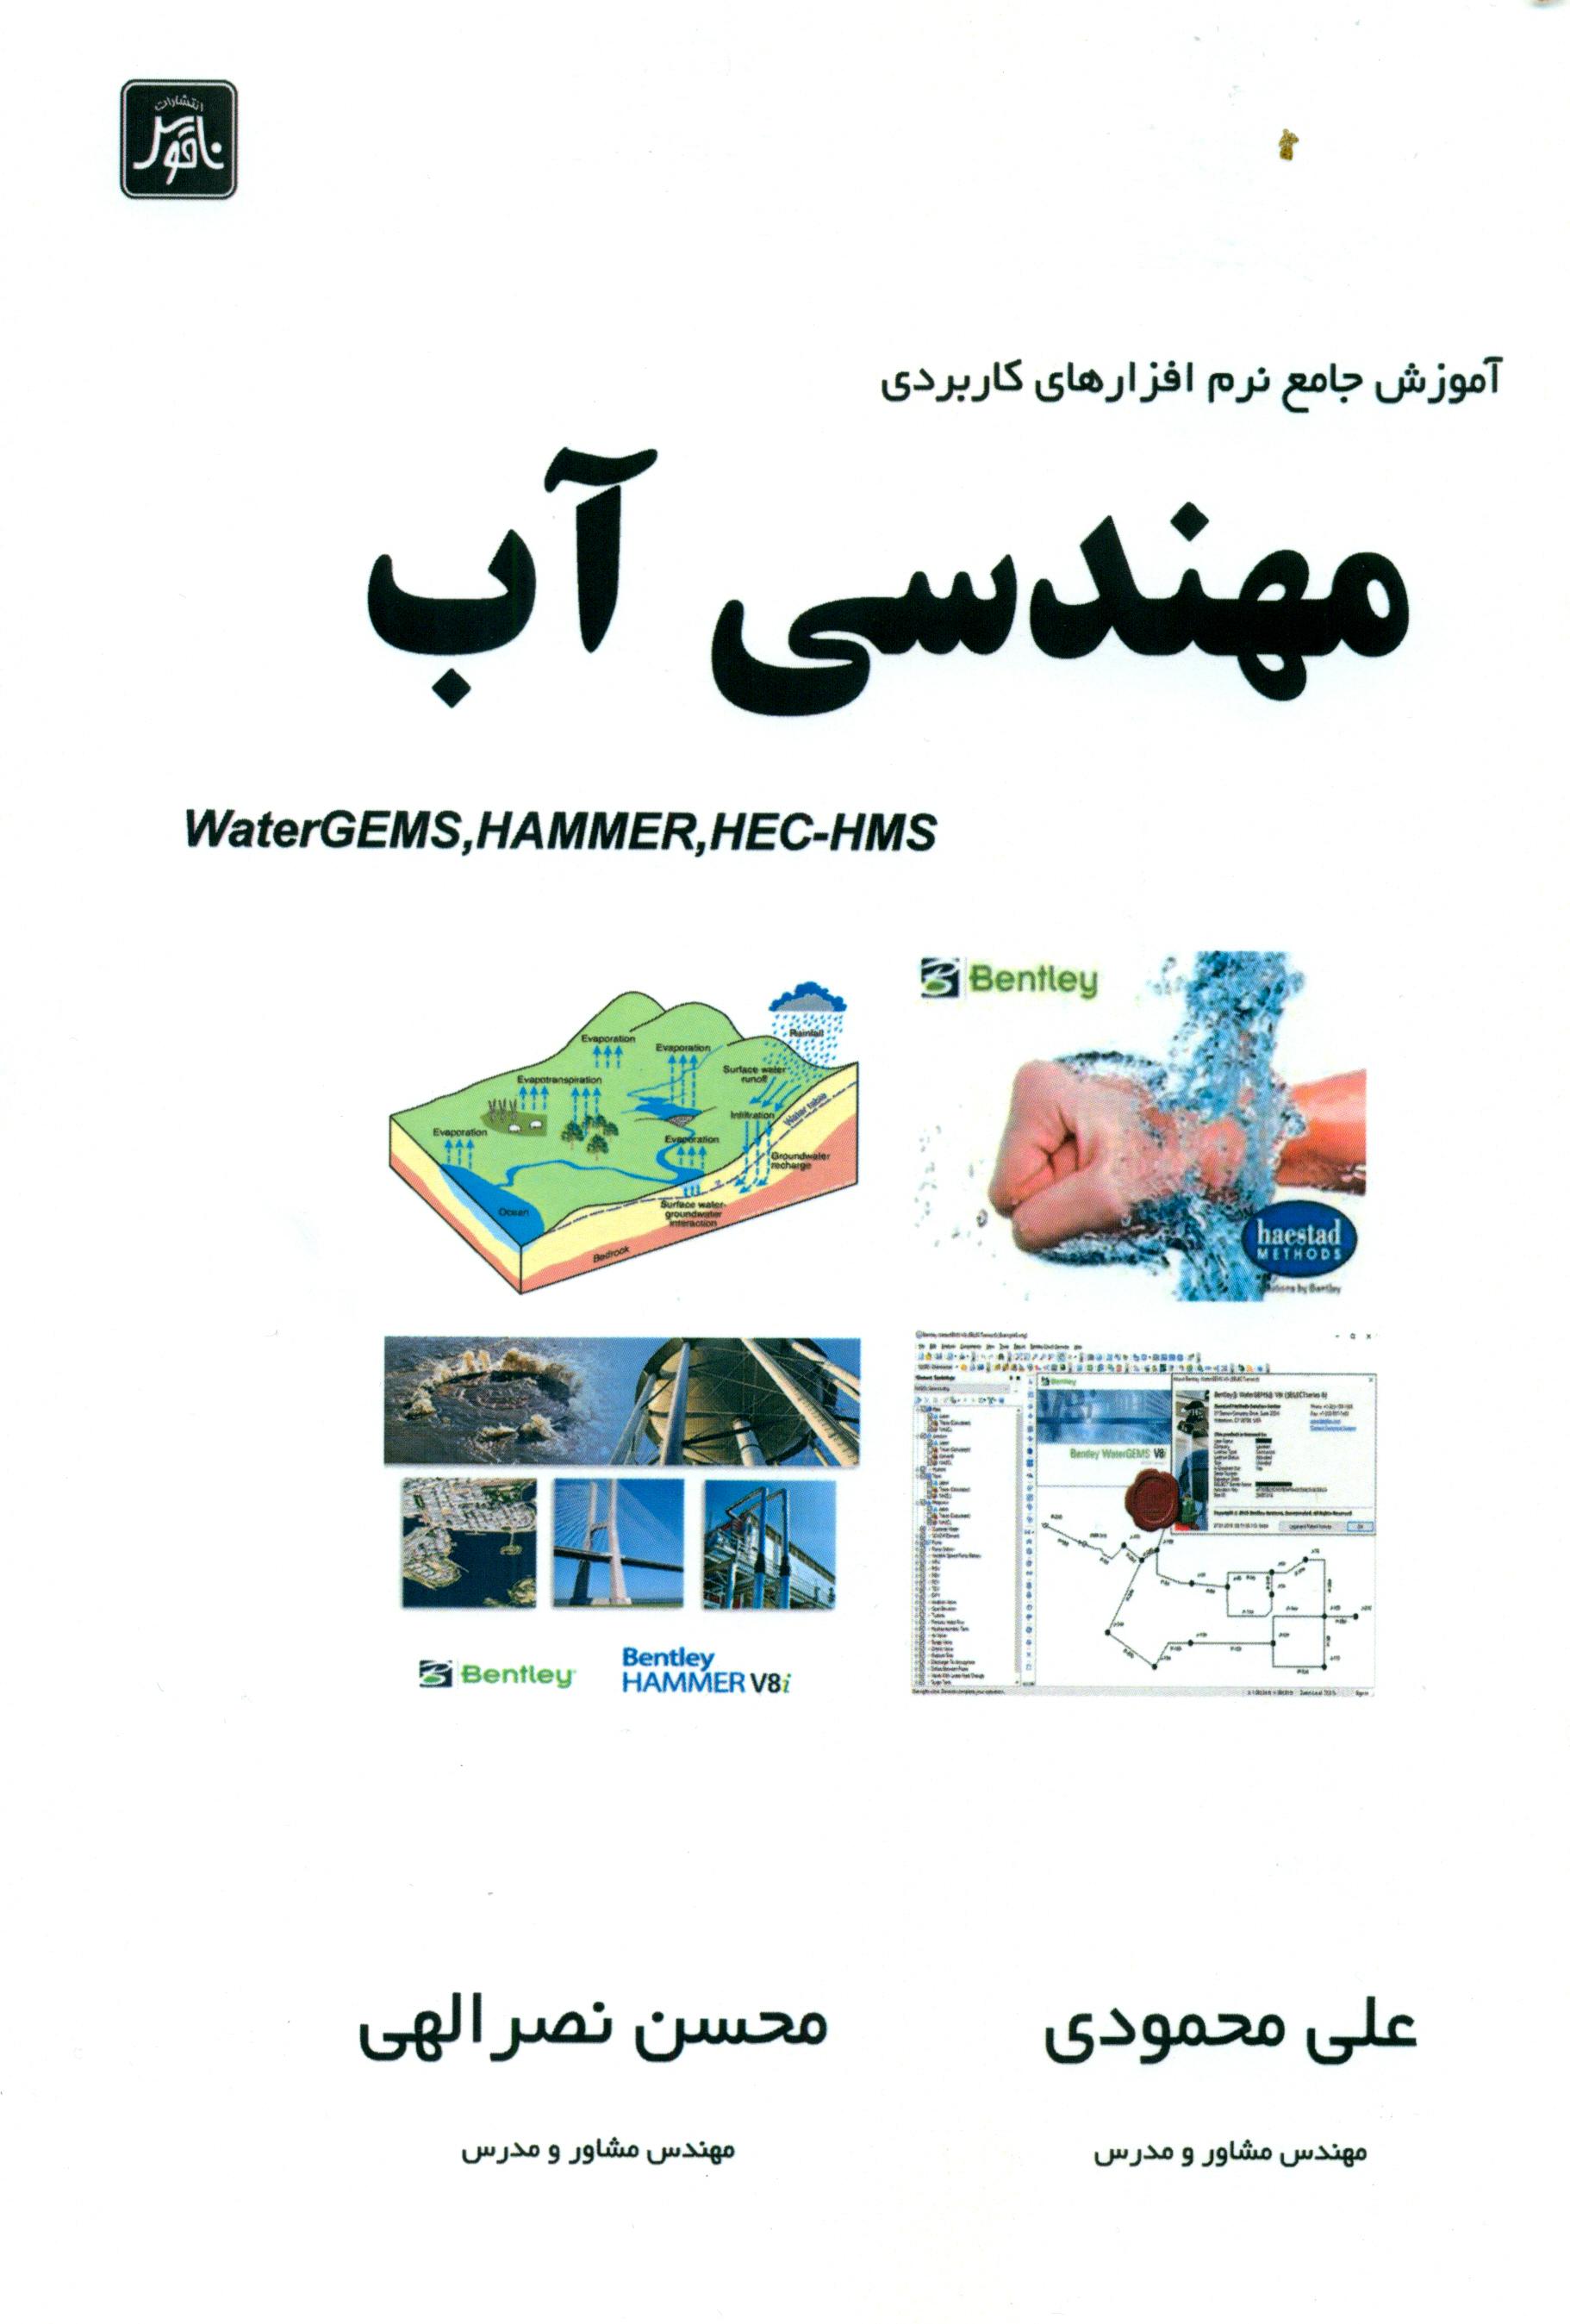 آموزش جامع نرم افزارهاي كاربردي مهندسي آبWaterGEMS،HAMMER،HE